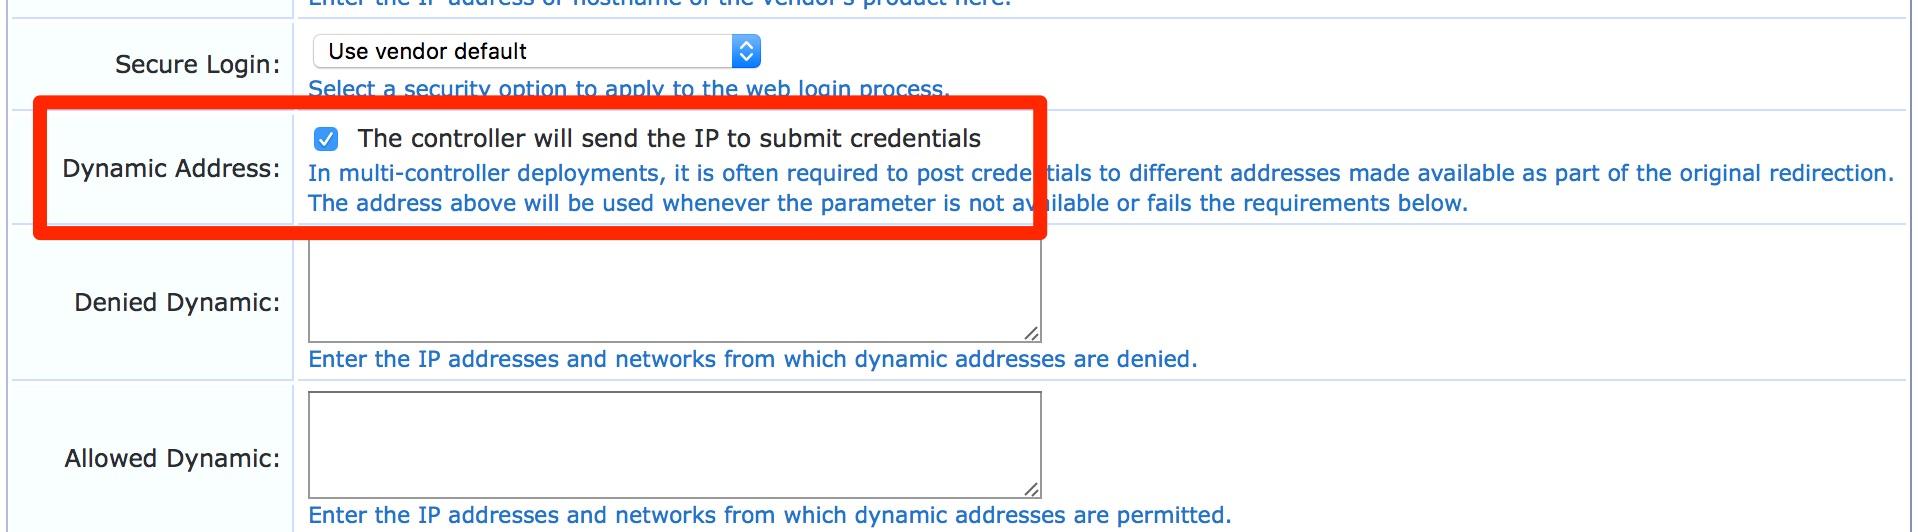 customize_guest_registration__dynamic_address.jpg